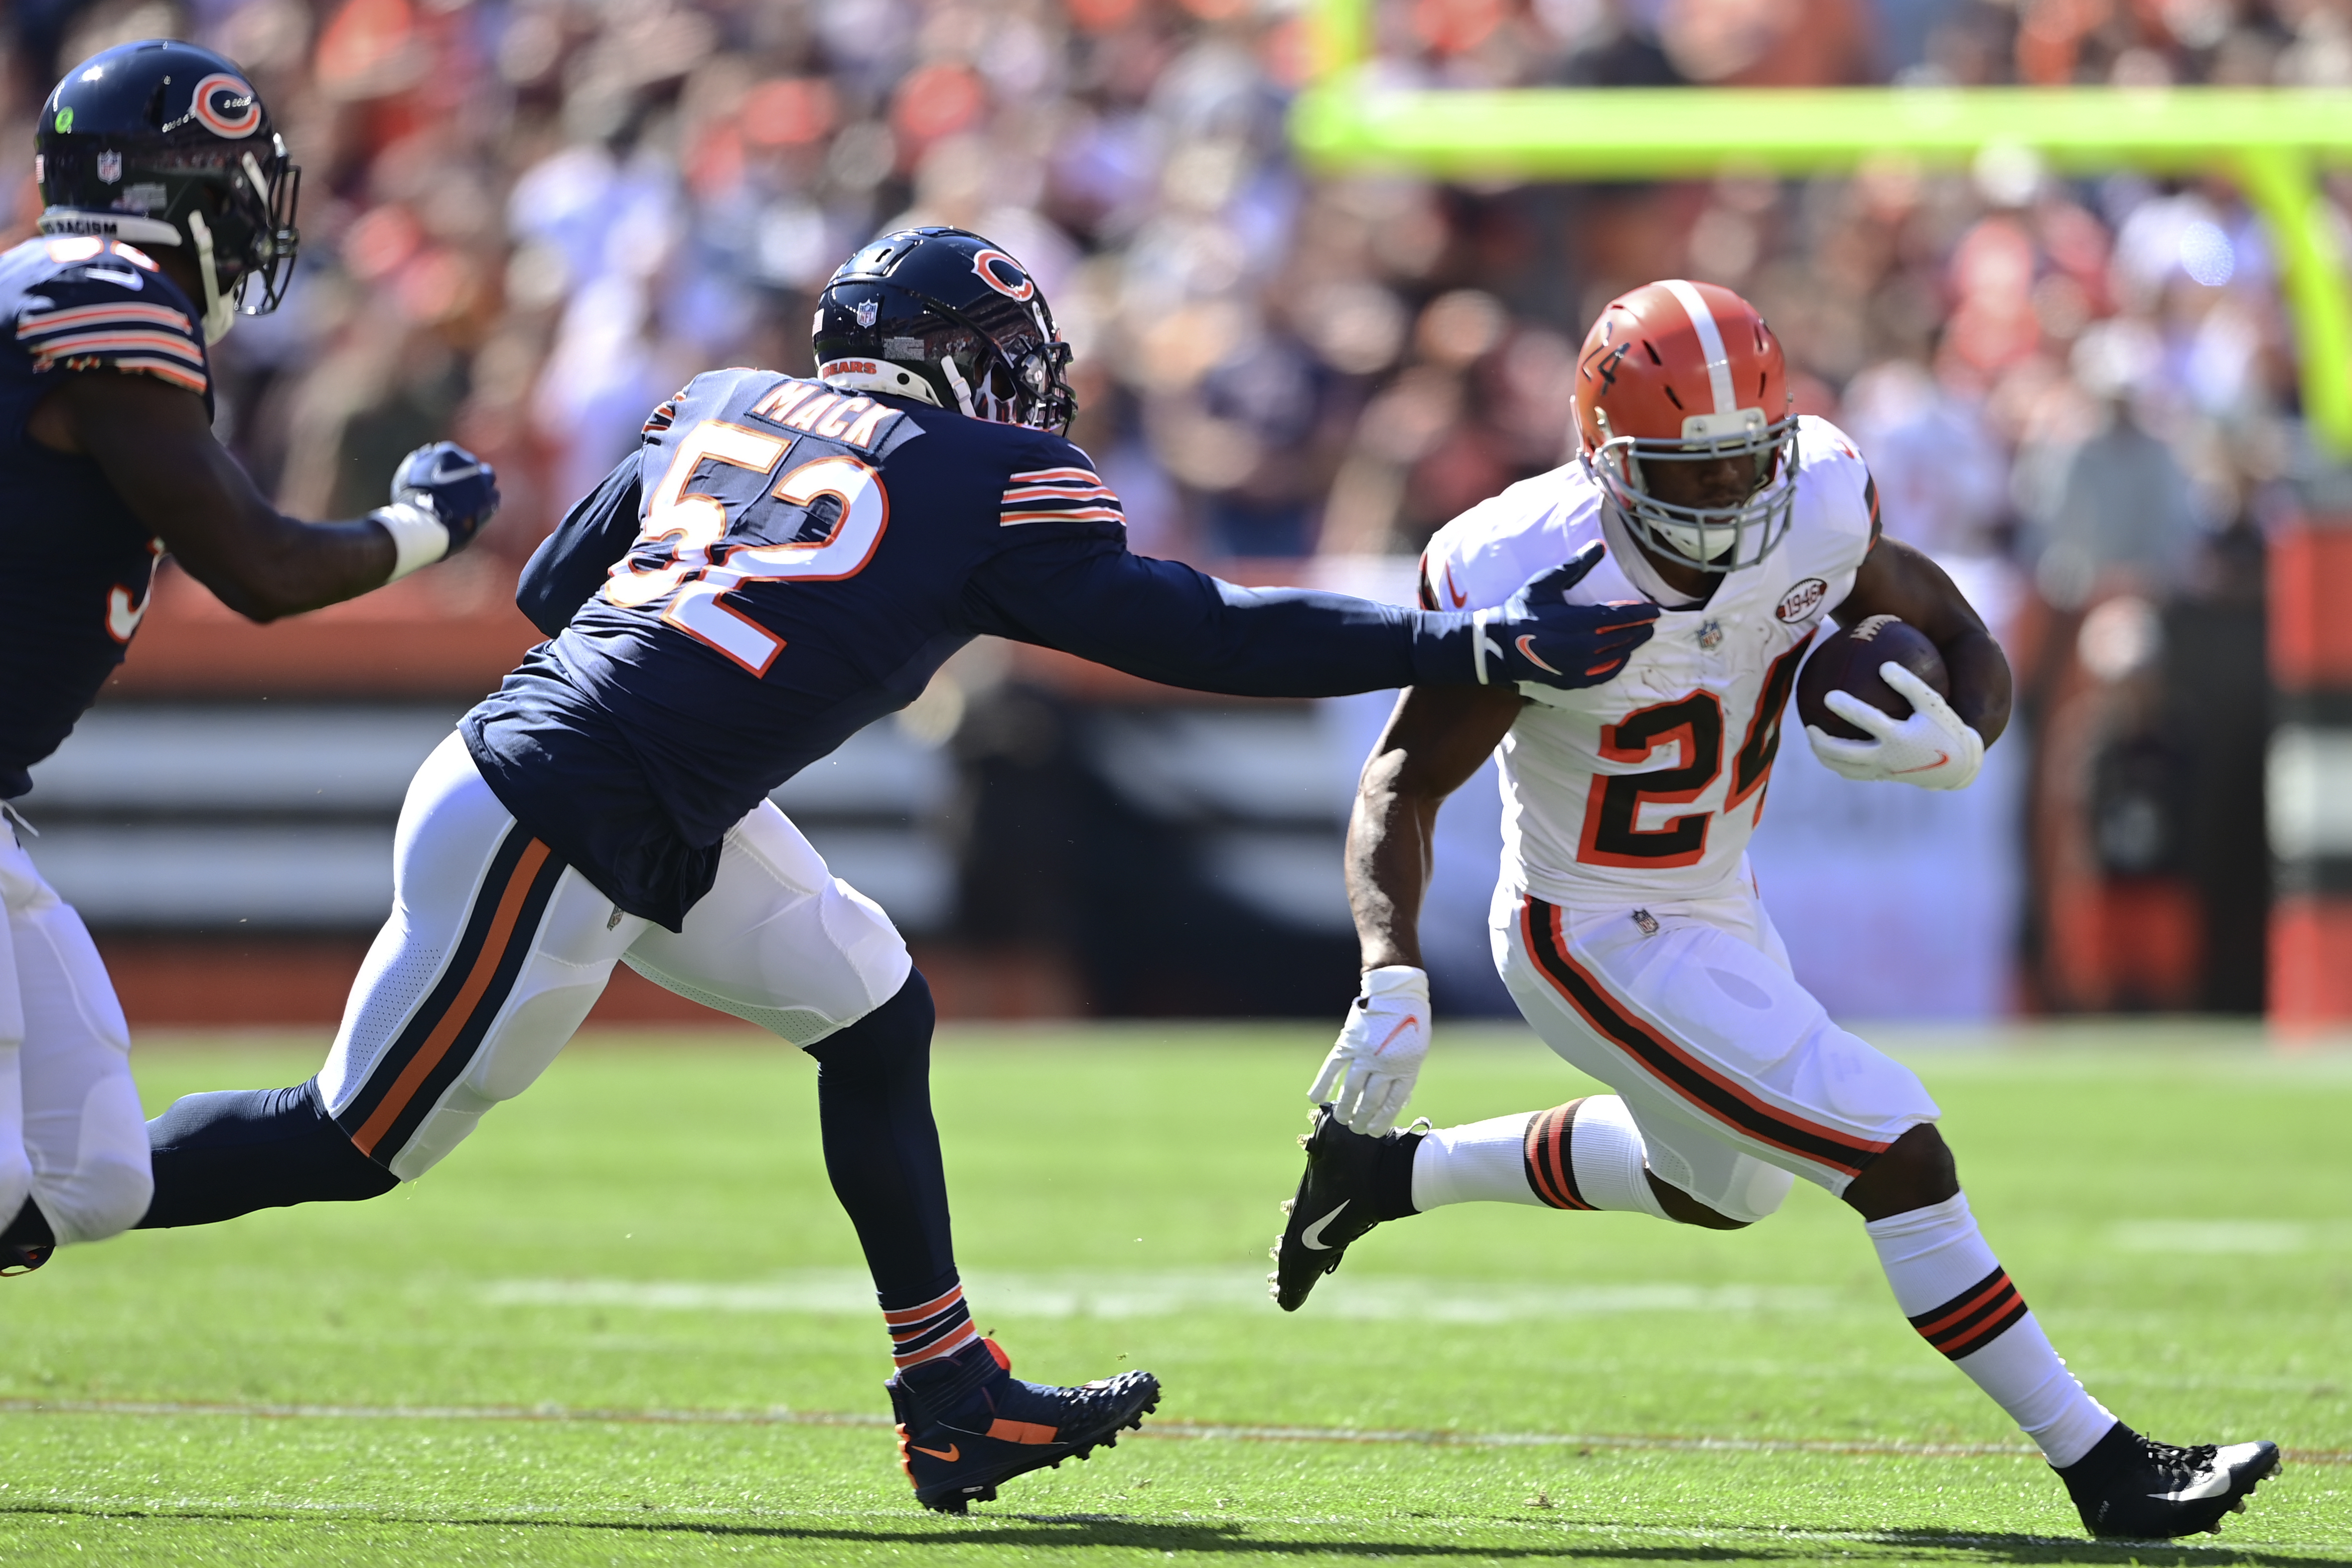 Bears outside linebacker Khalil Mack sprained his foot Sunday.